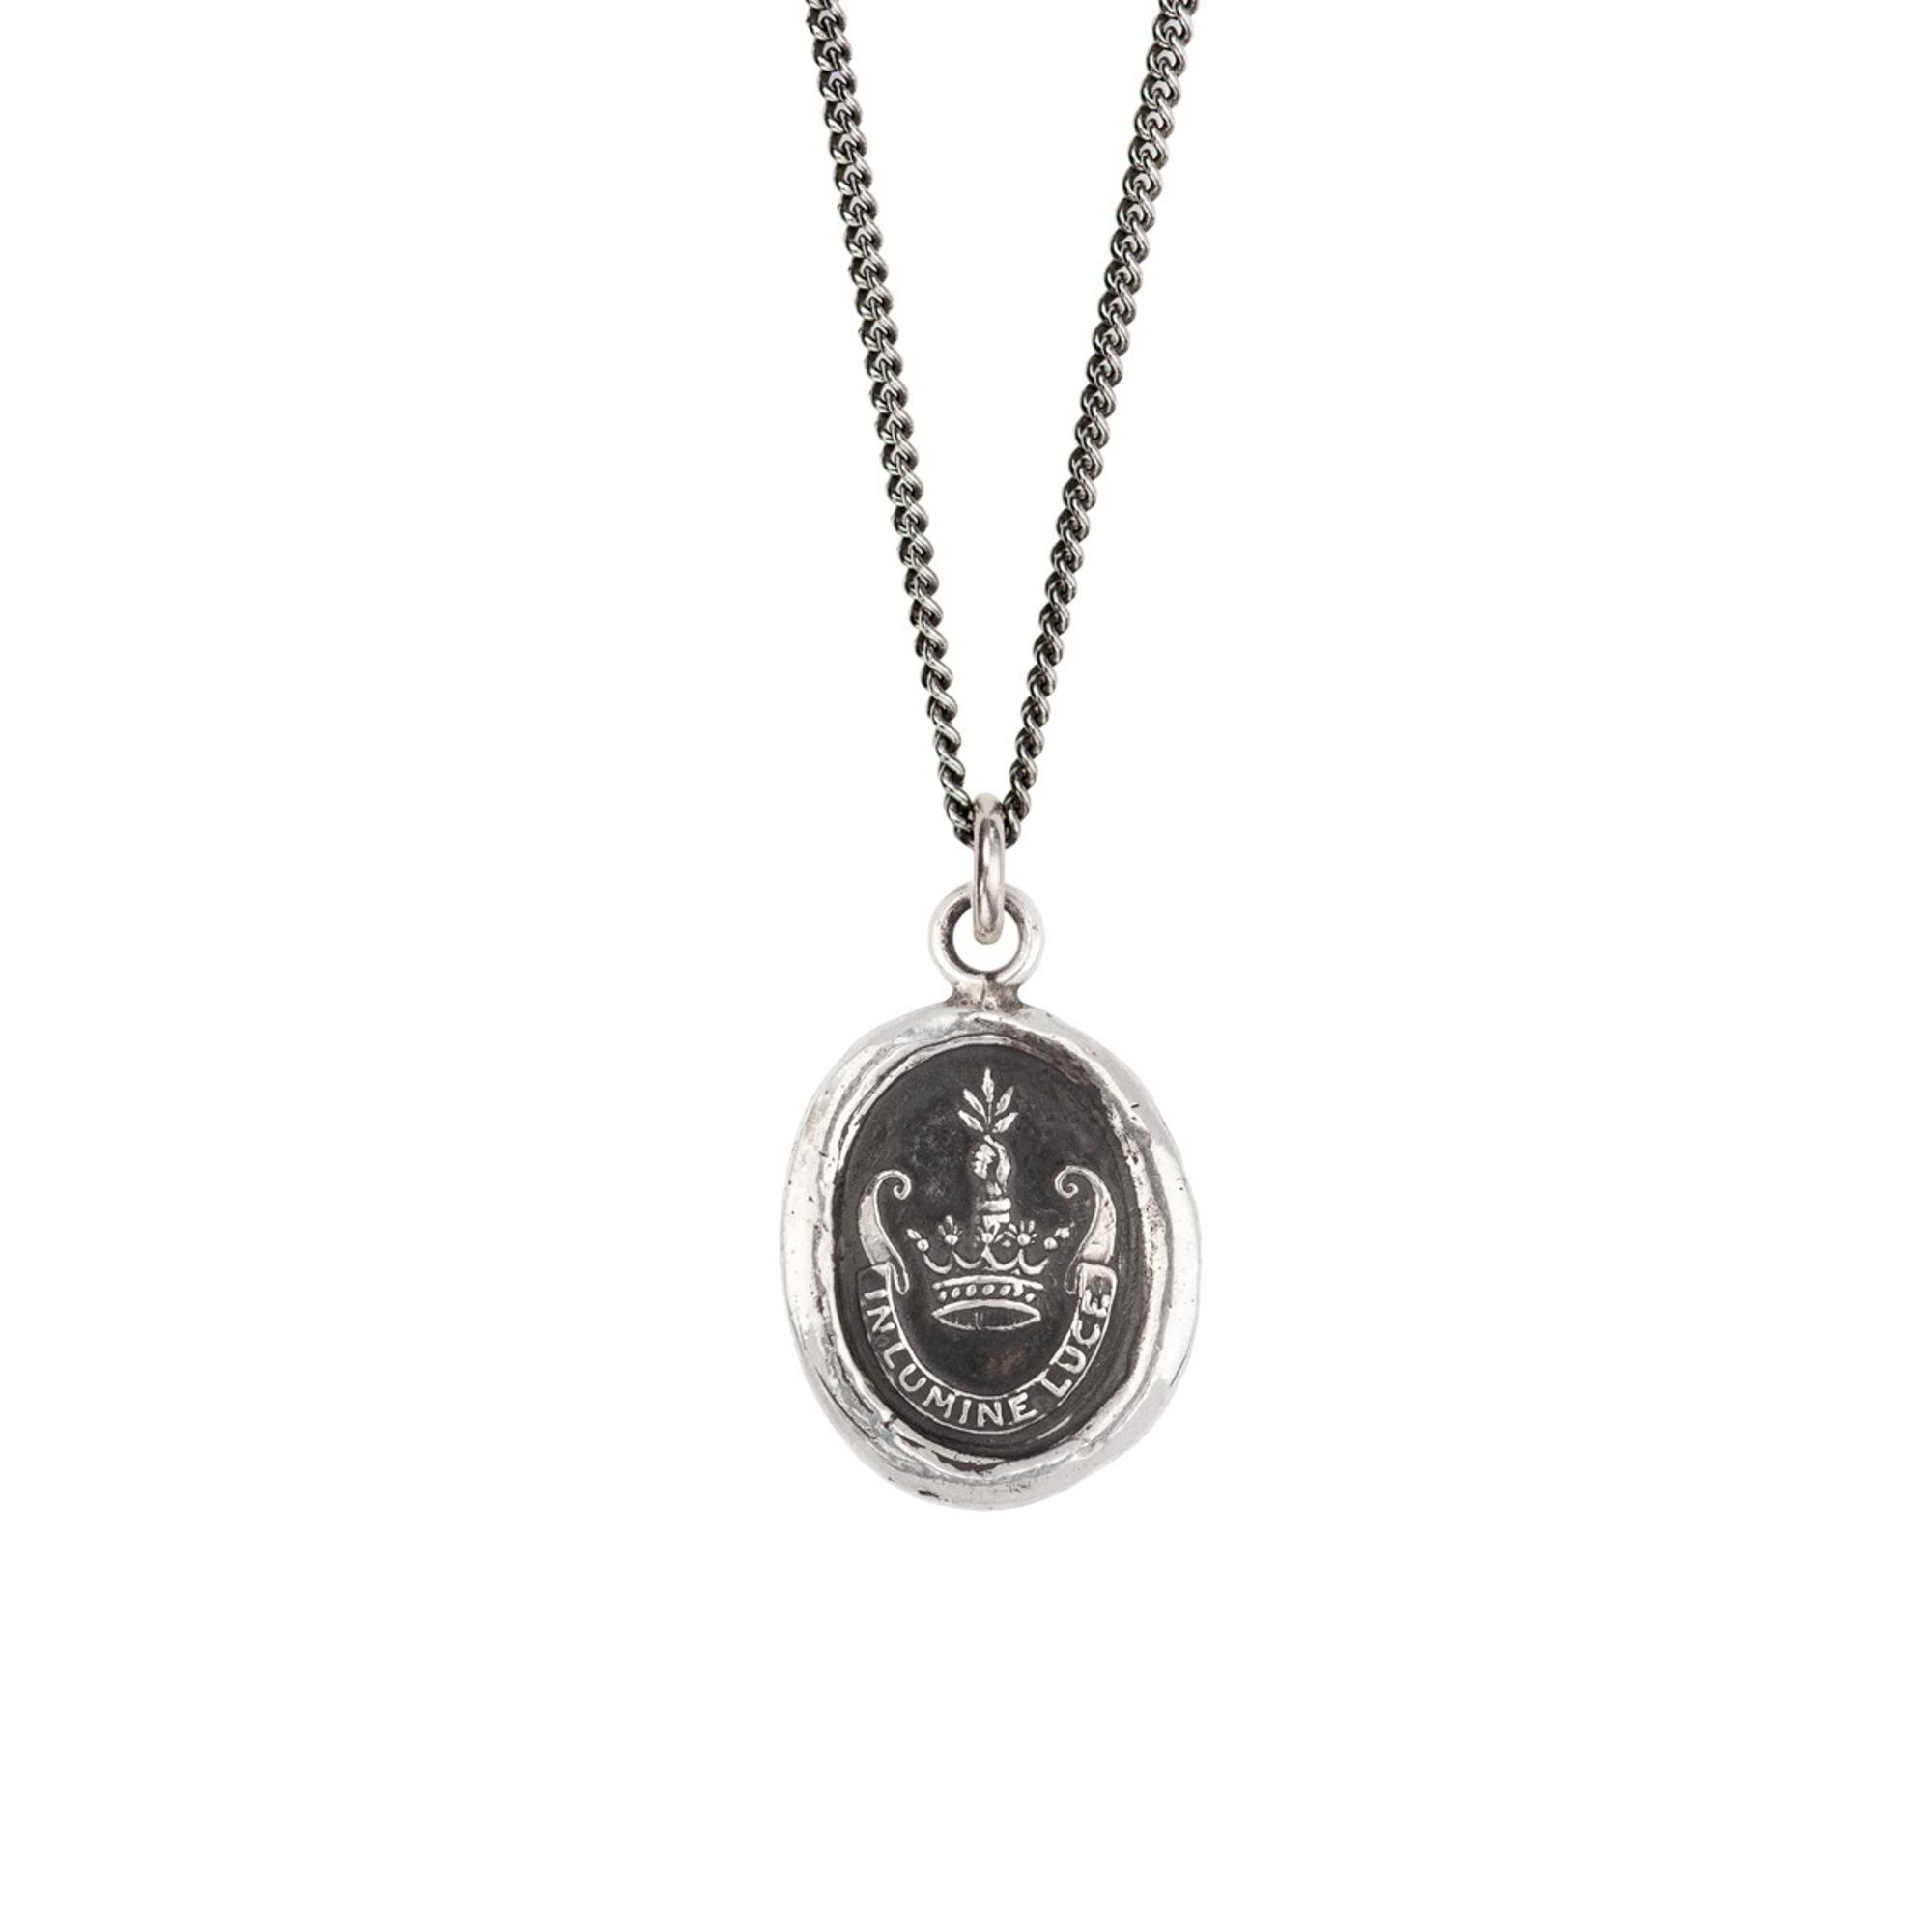 Pyrrha Sterling Silver Inspiration Talisman Necklace